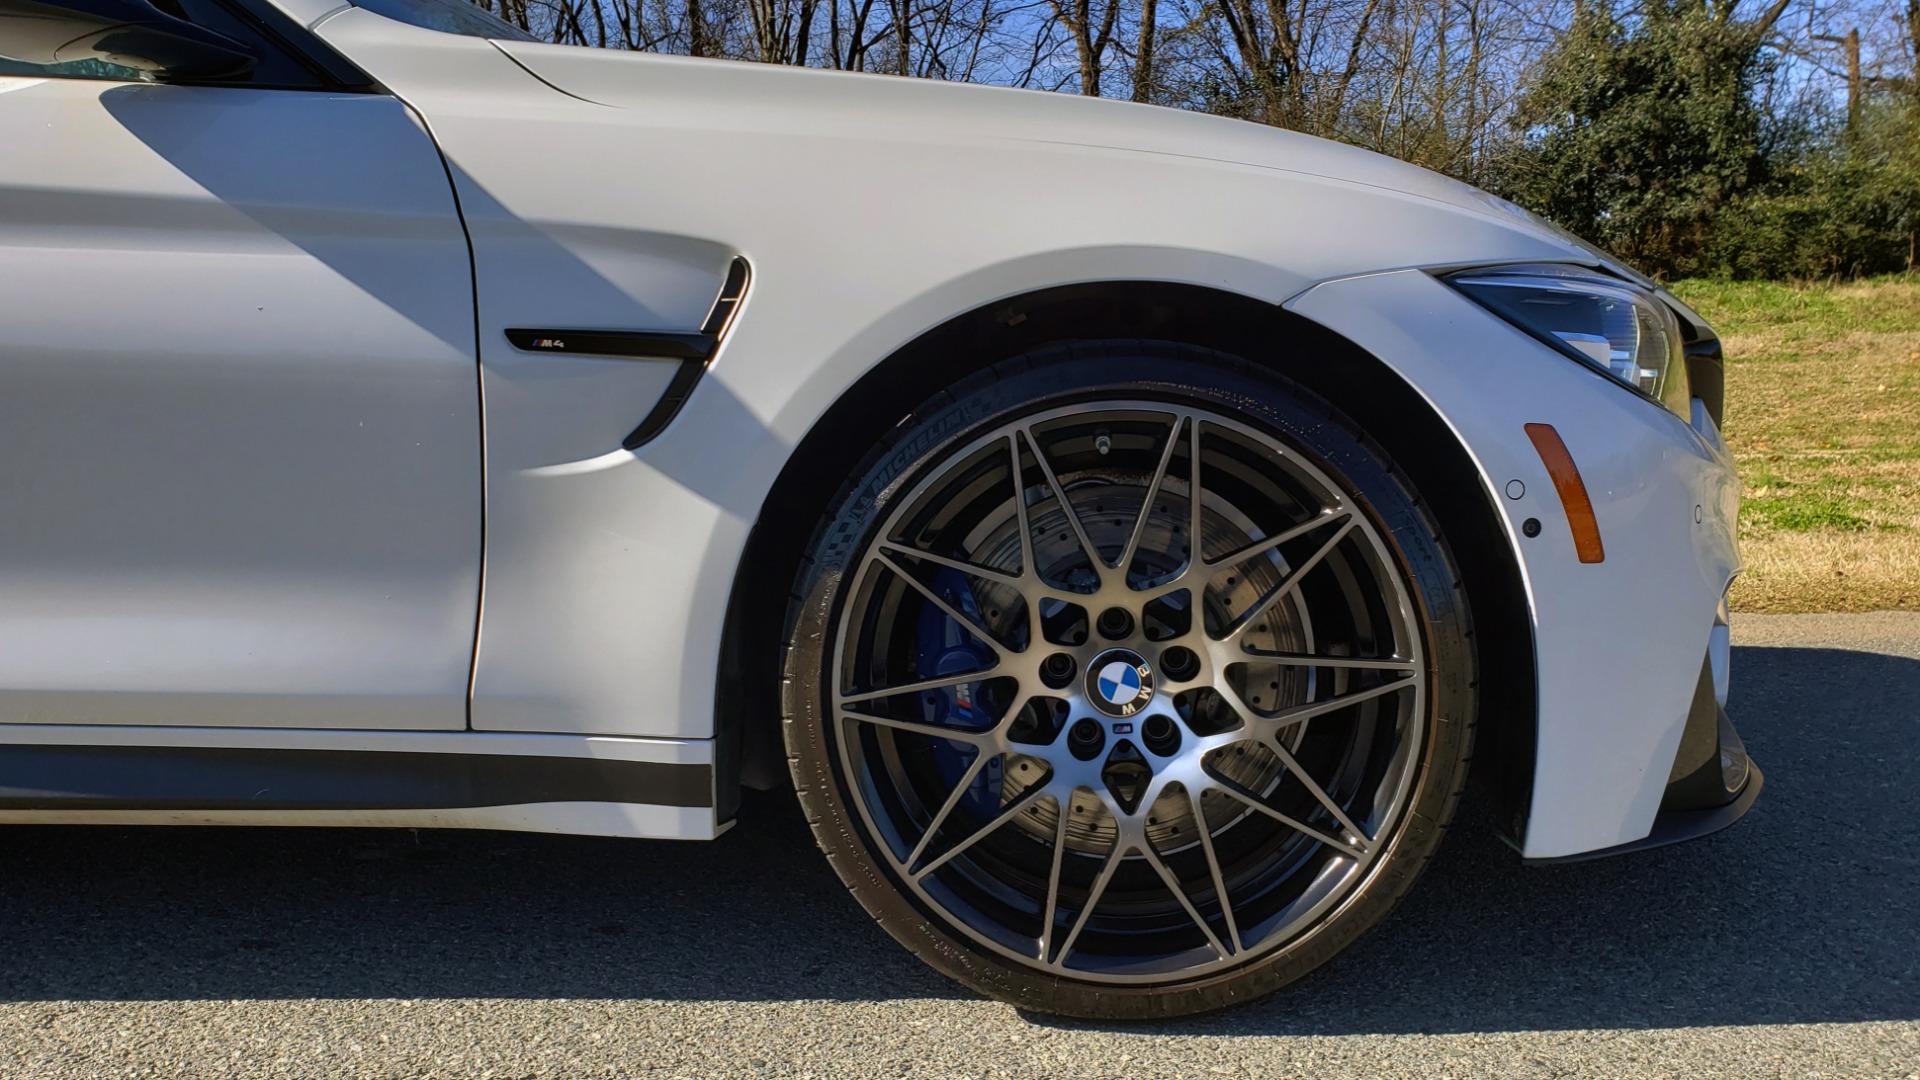 Used 2018 BMW M4 COMP PKG / EXEC / M-DRIVER / PARK CNTRL / ACTIVE BLIND SPOT for sale $45,449 at Formula Imports in Charlotte NC 28227 77